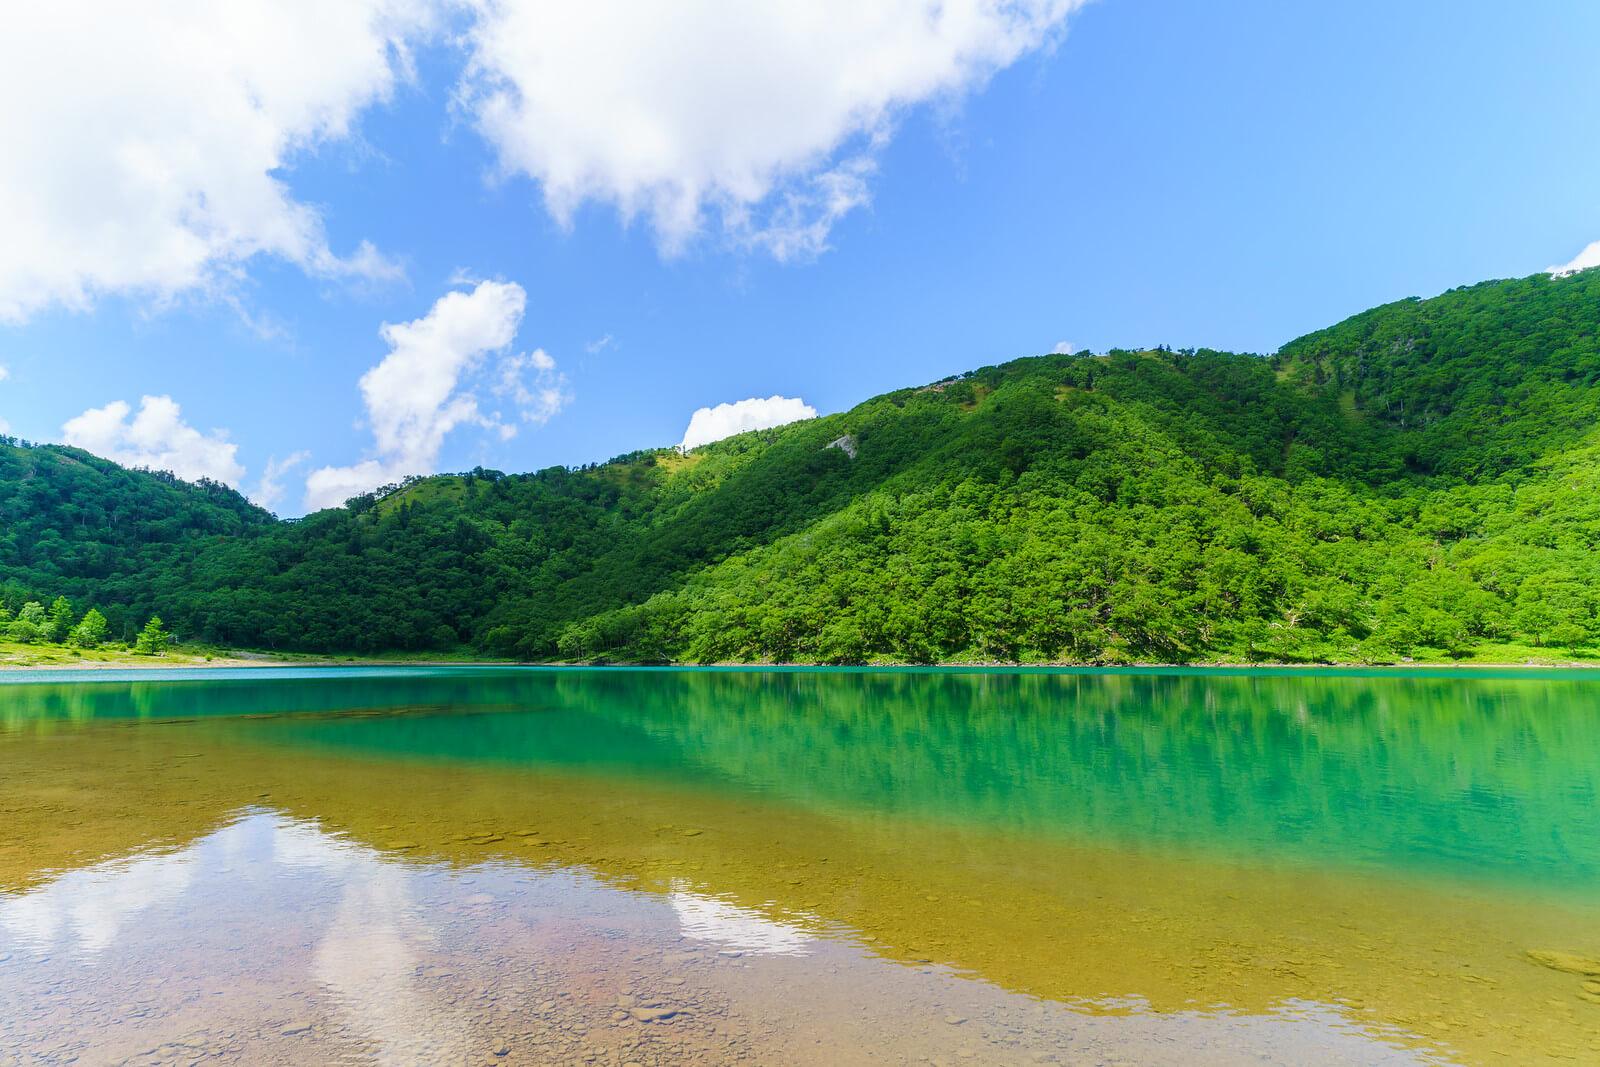 Lago giapponese (goshiki-numa)